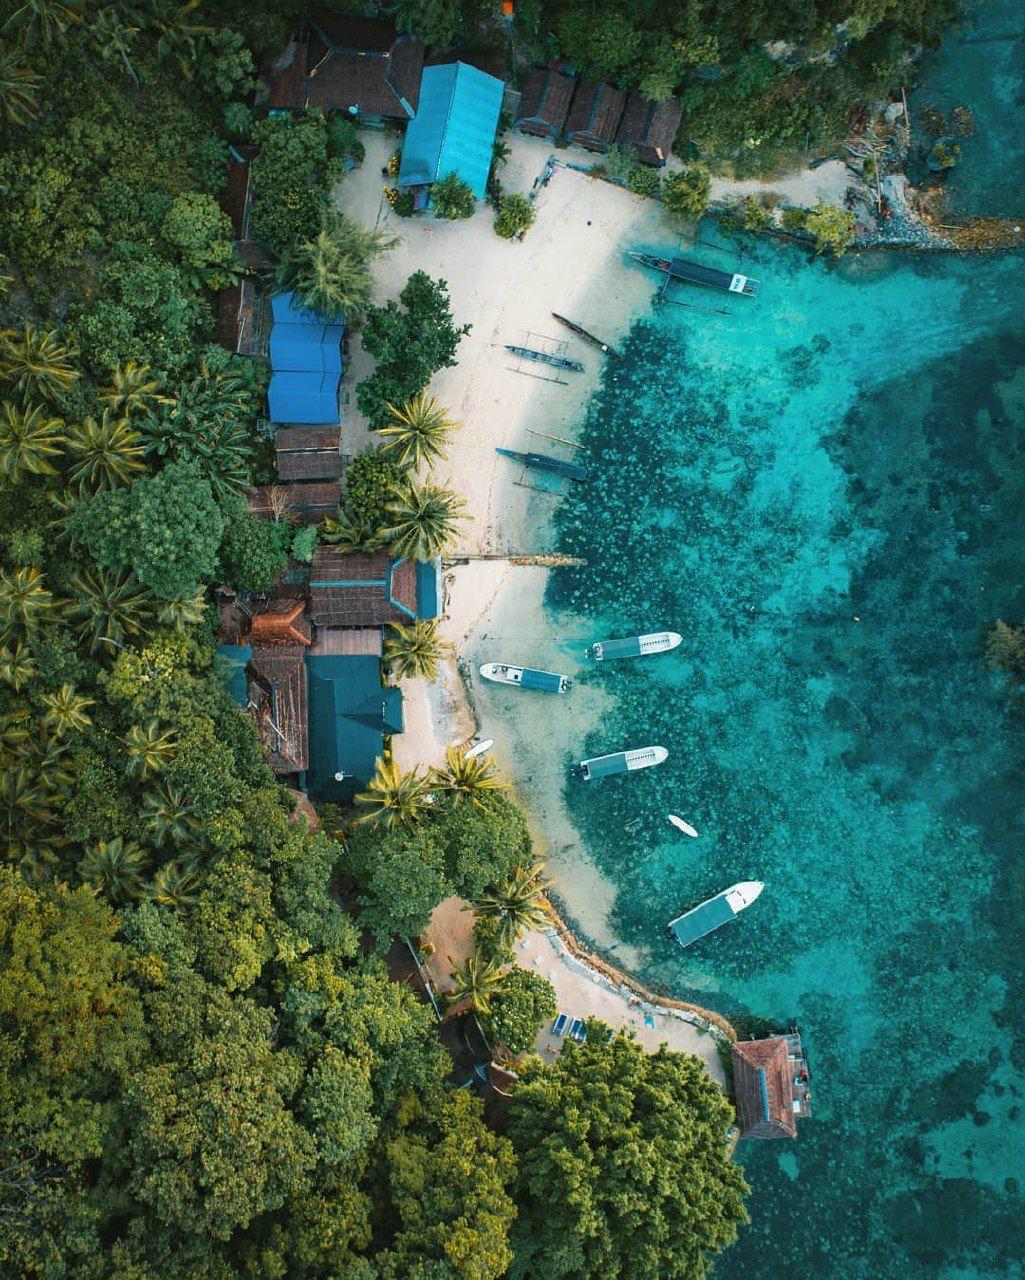 An amazing aerial view of Kadidiri Resort in Togean